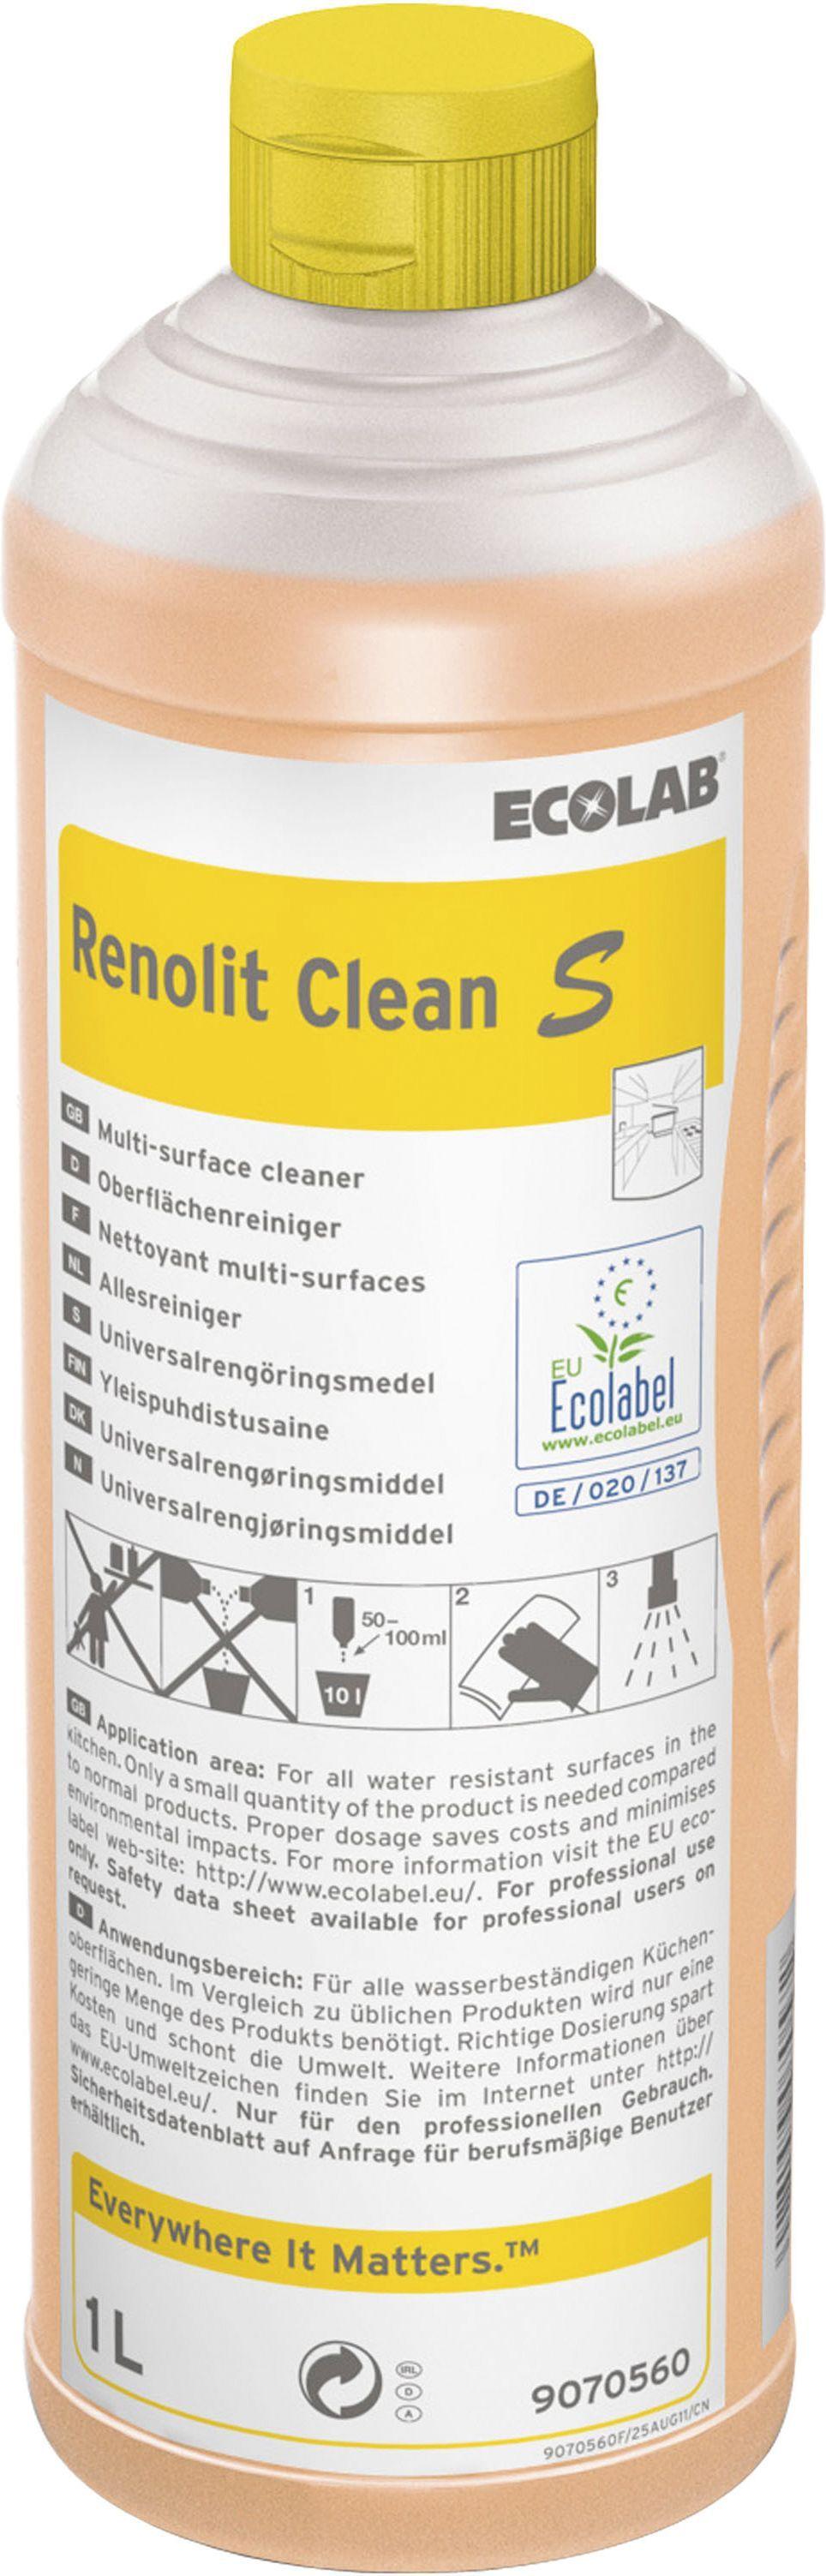 Ecolab Rengjøring Renolit Clean S 1 l 9070560